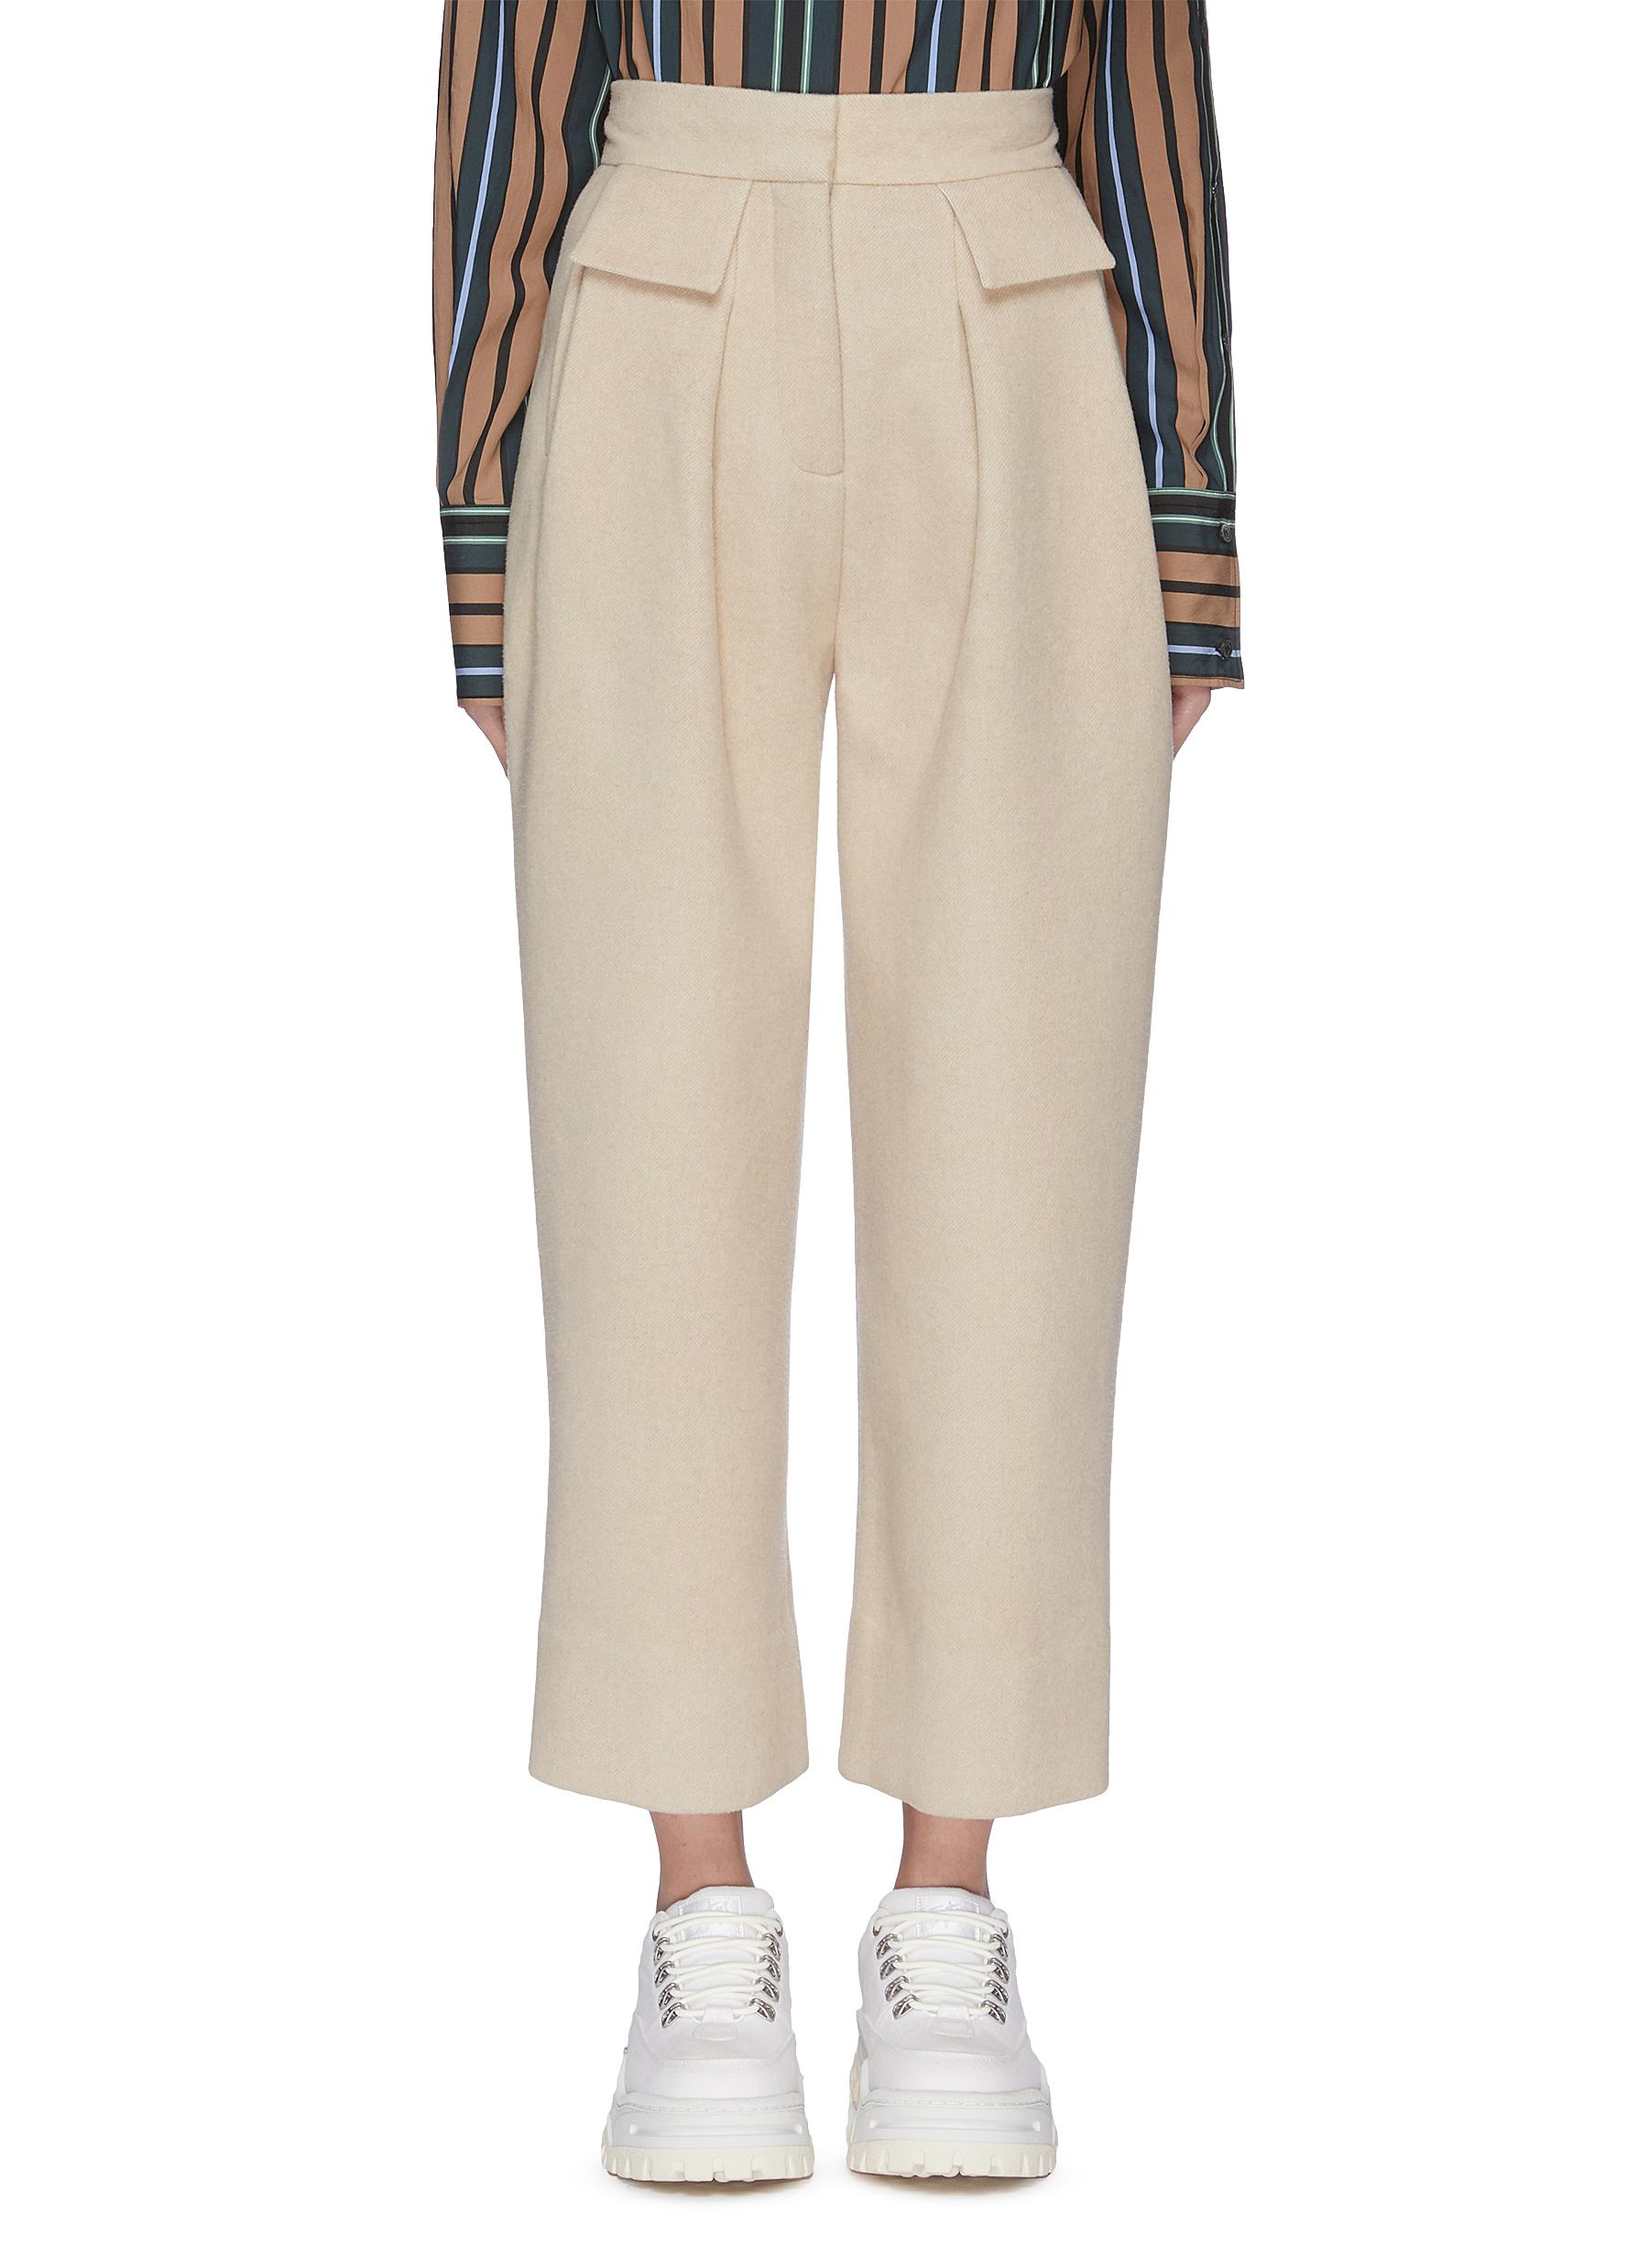 Weekday flap pocket twill pants by Ffixxed Studios